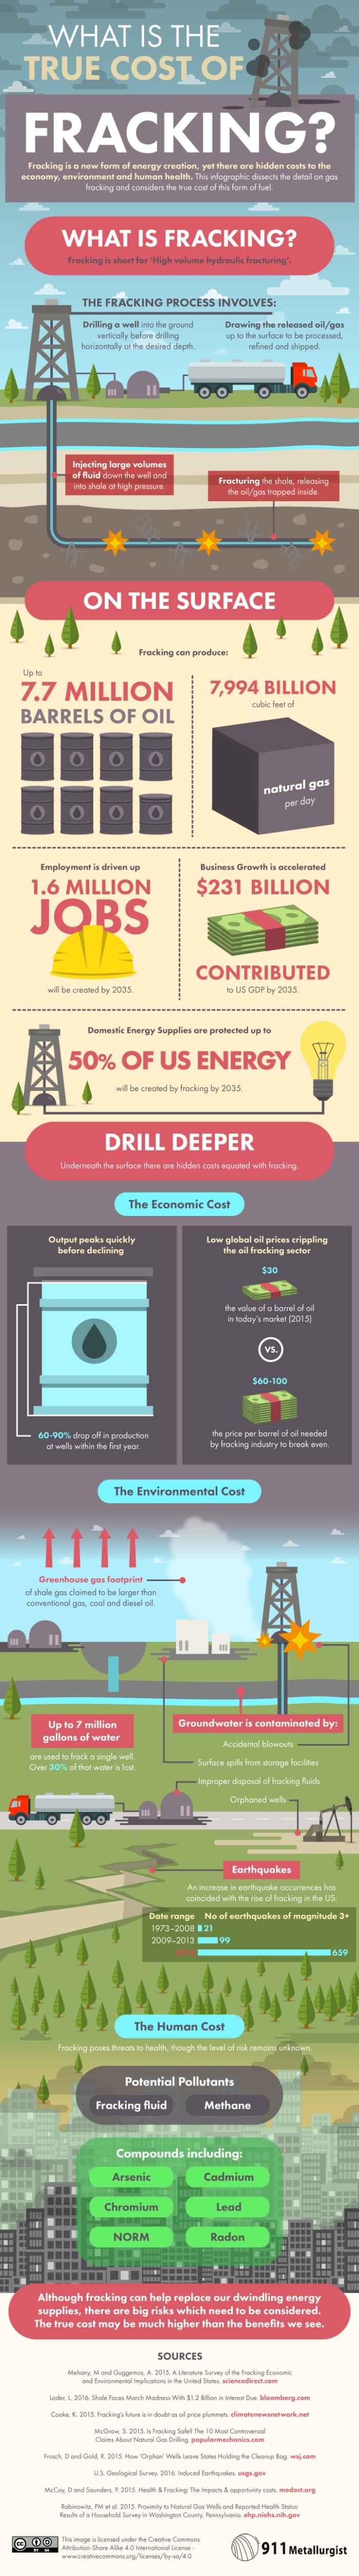 the-true-cost-of-fracking-dv3